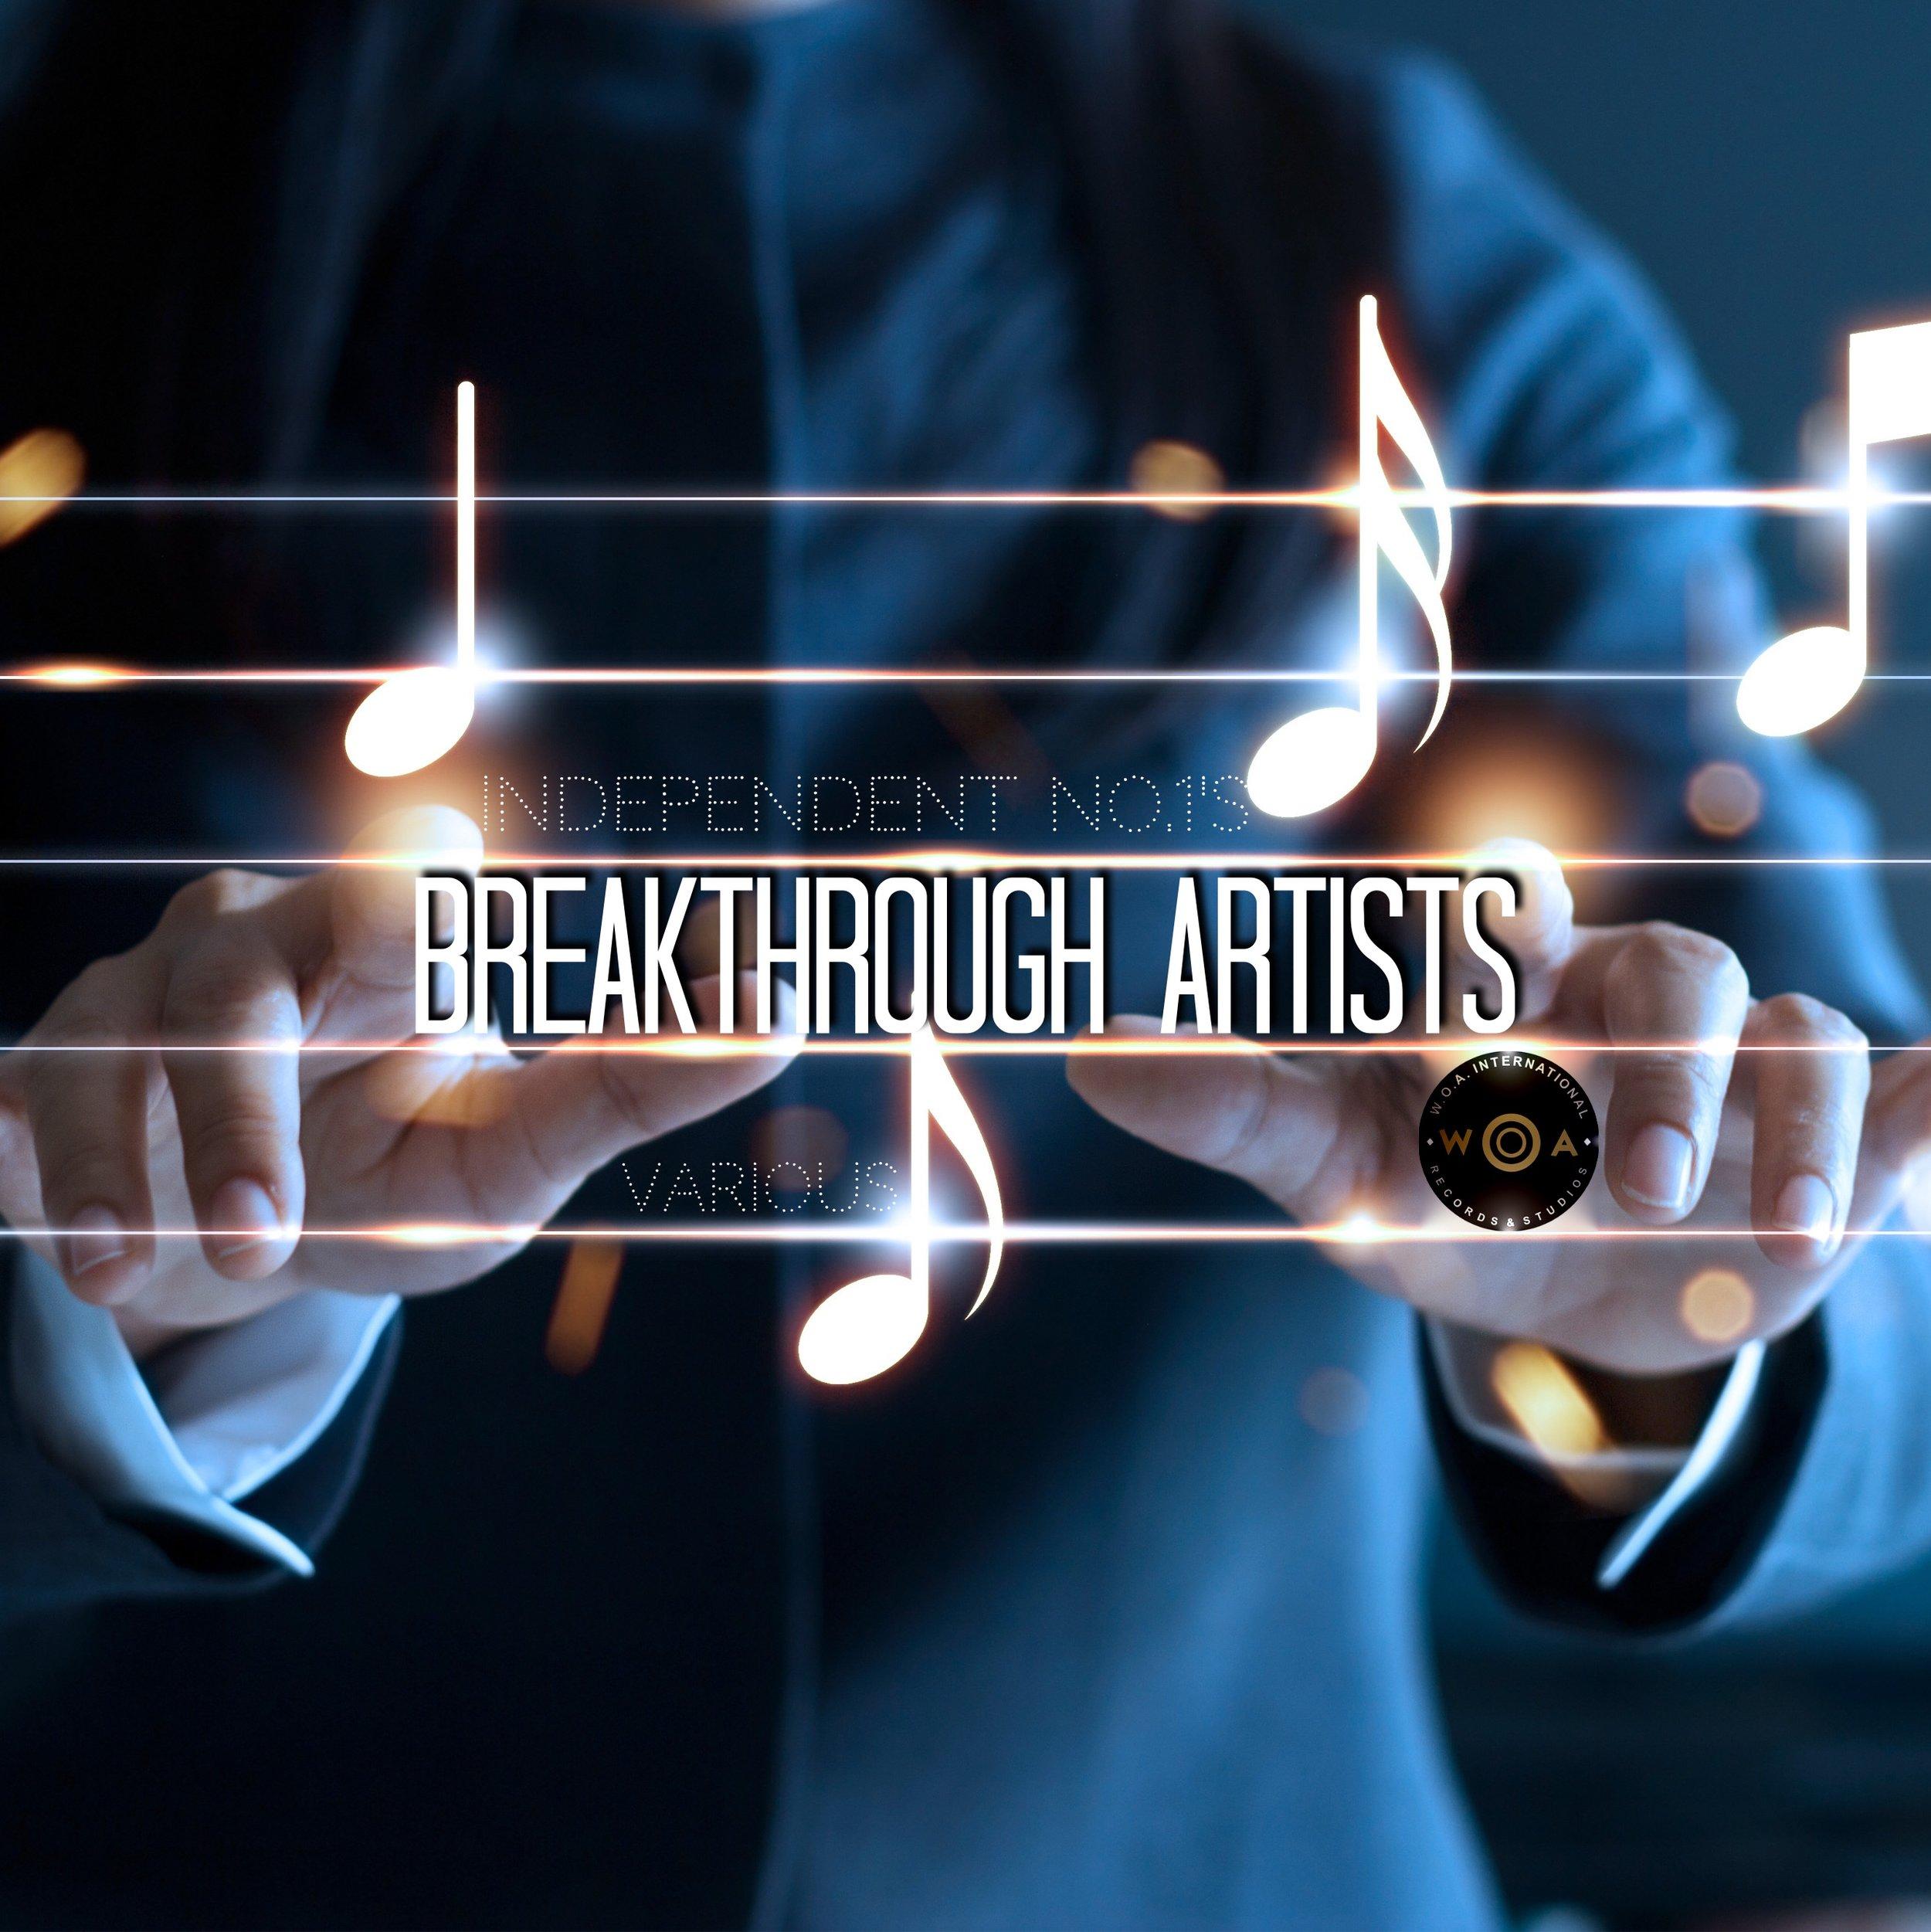 WOA Breakthrough Artists - The select few WOA Artists who have hit the 62nd Grammy Nomination Ballots: Cathy Varna, Swift Timmy, Glenn Shayne, Silent Stranger, Dave Matheson El Colorado, Gen Lacroix, Andrea Plamandon and Scott MacPherson.